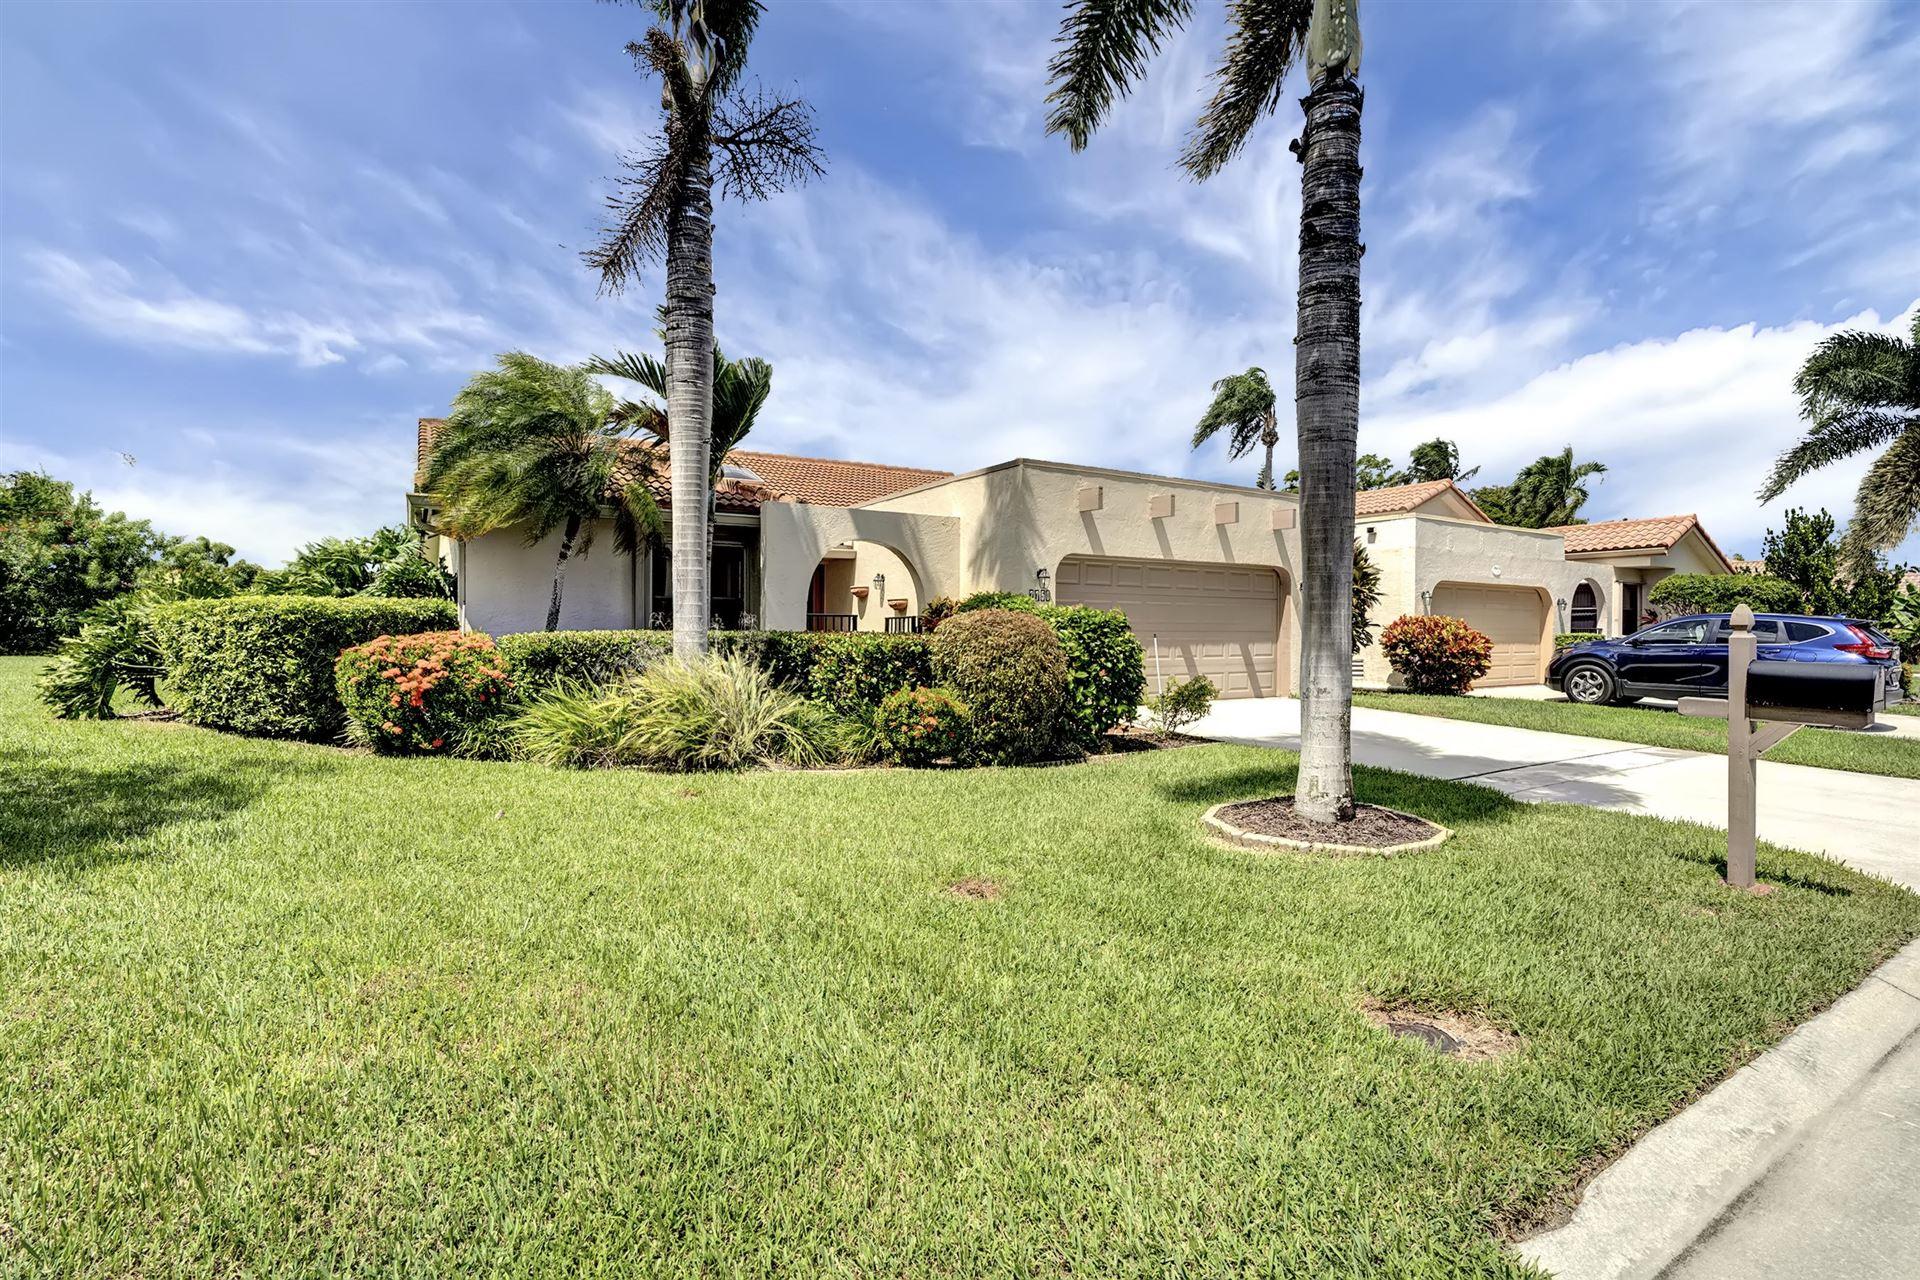 Photo of 7750 Solimar Circle, Boca Raton, FL 33433 (MLS # RX-10658004)